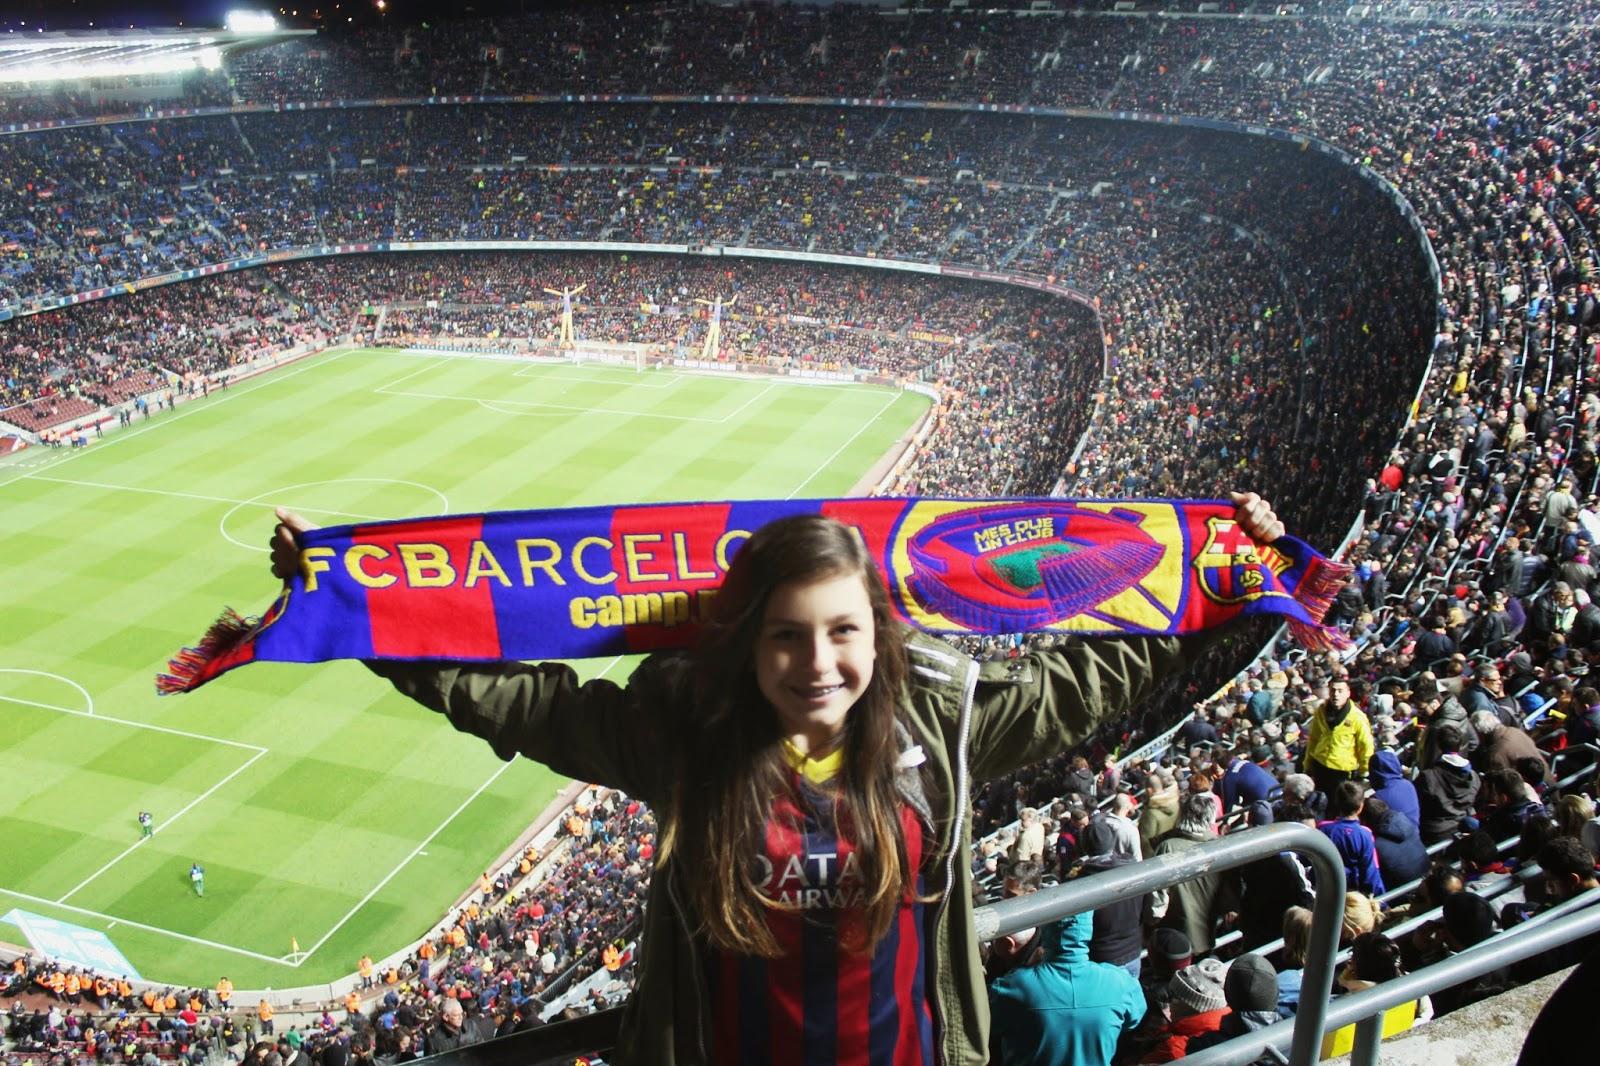 el classico, FCBarcelona, Barcelona, camp nou, ile kosztuja bilety na camp nou fcbarcelona, wyjazd do Barcelony na mecz, stadion camp nou